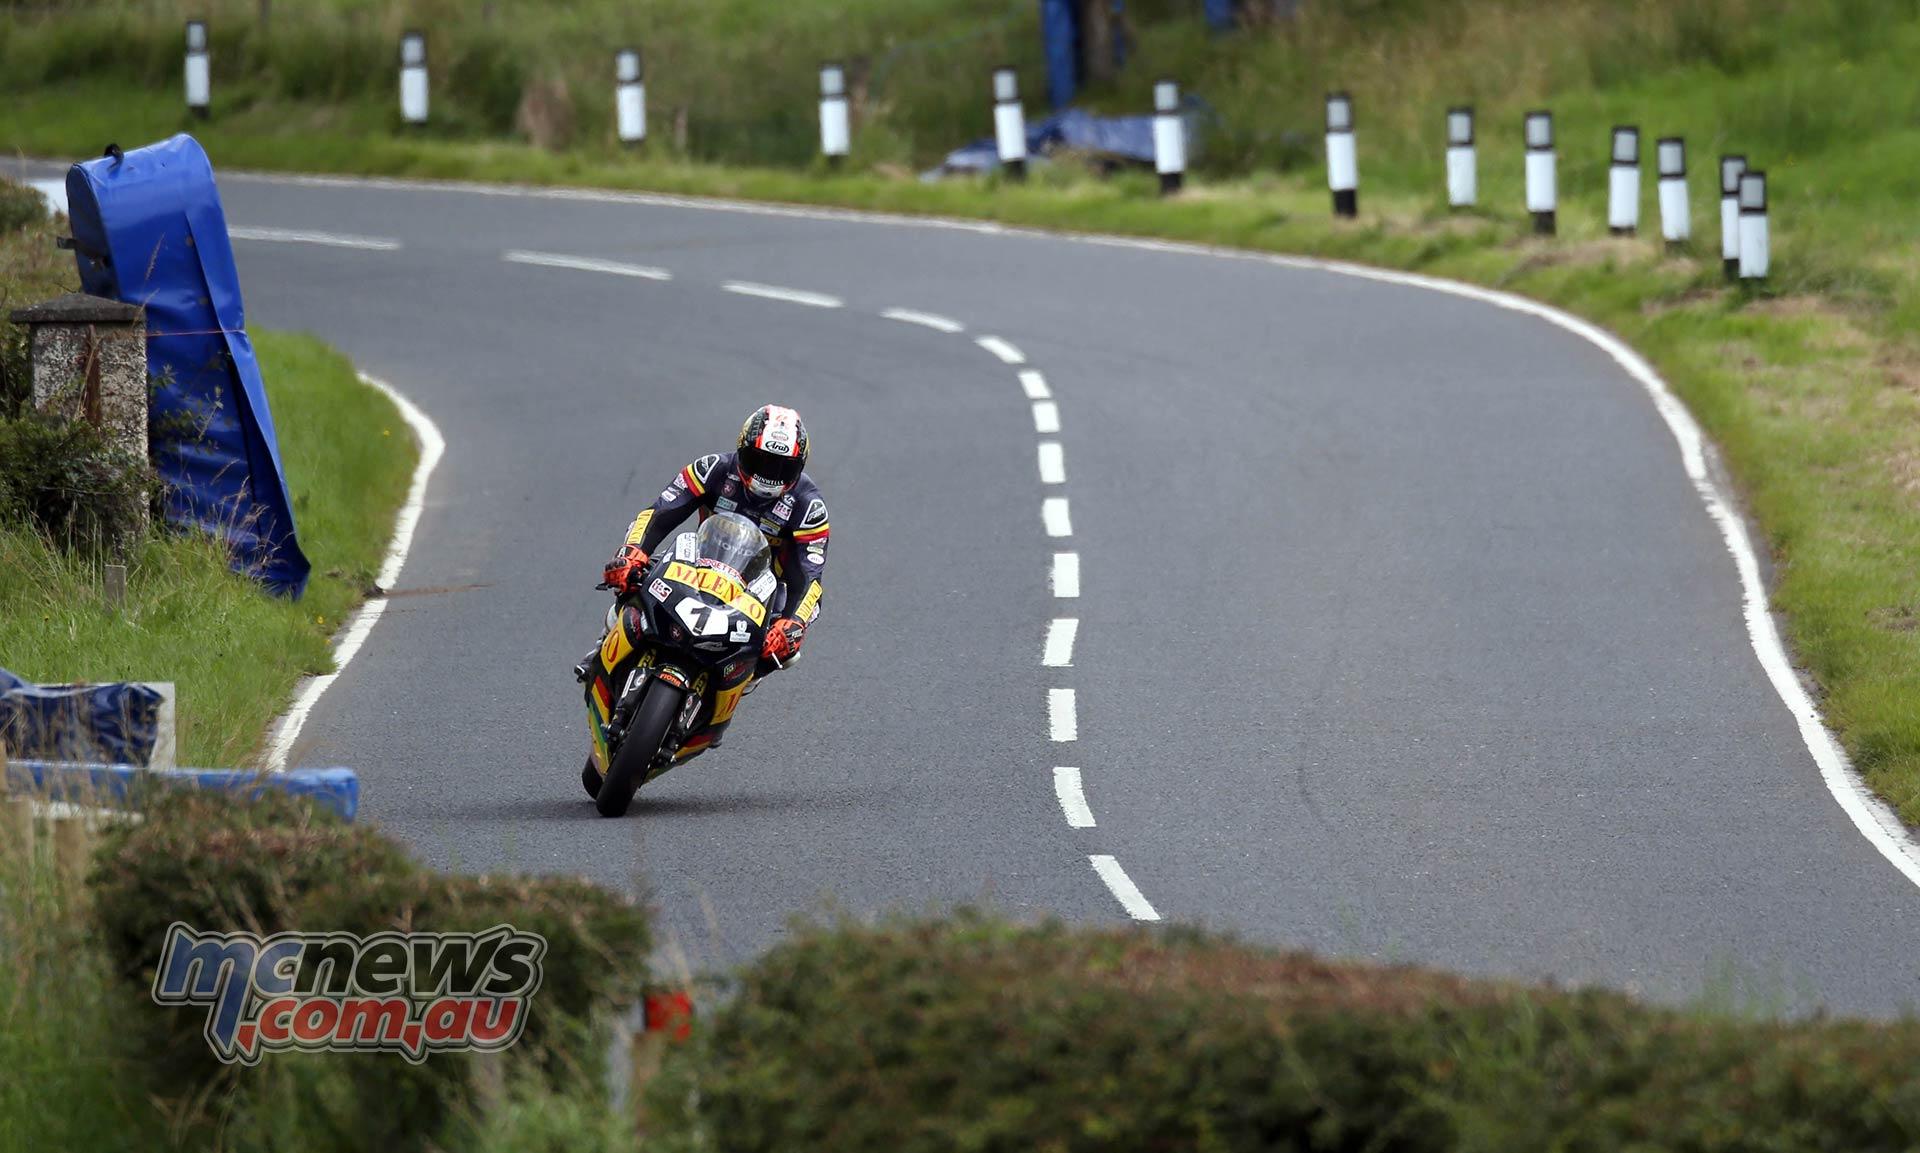 Ulster GP SBK Conor Cummins